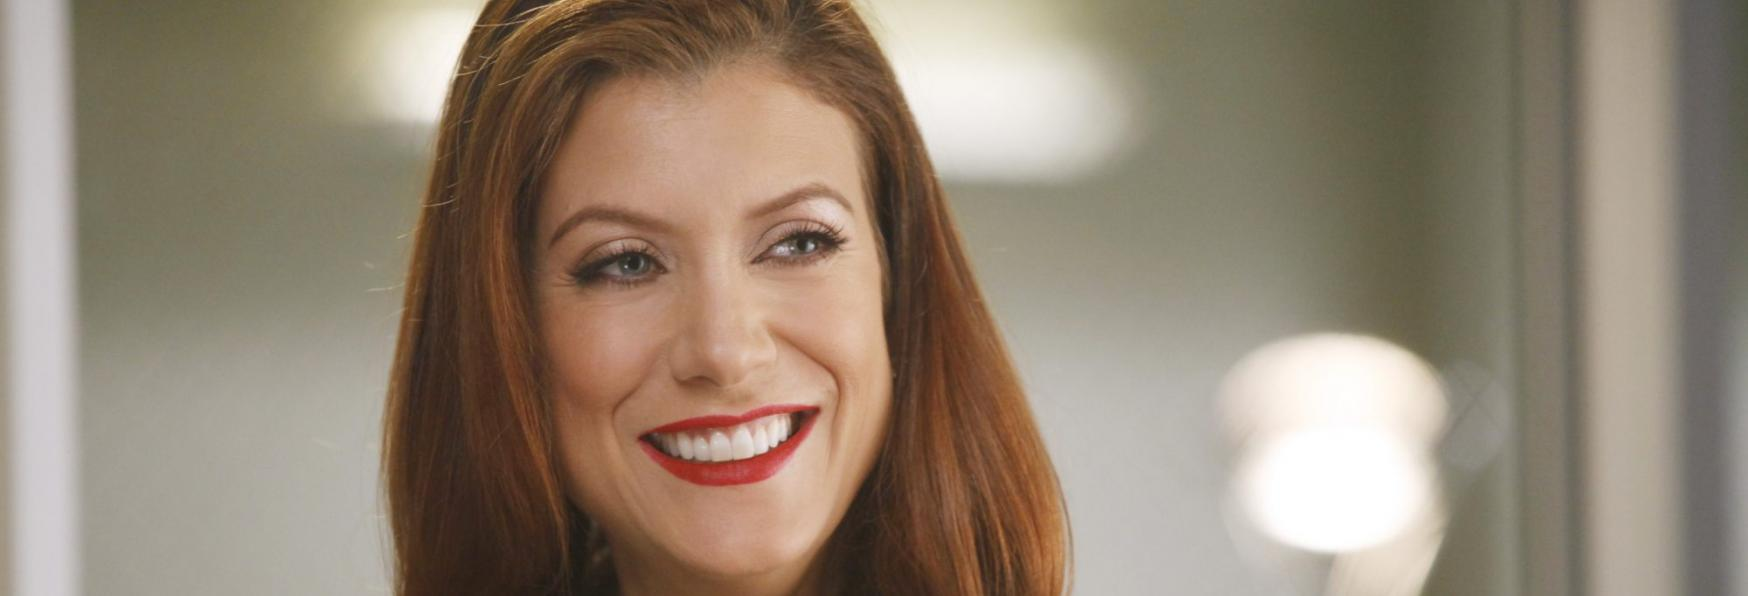 Grey's Anatomy 18: la star Kate Walsh tornerà nella nuova Stagione